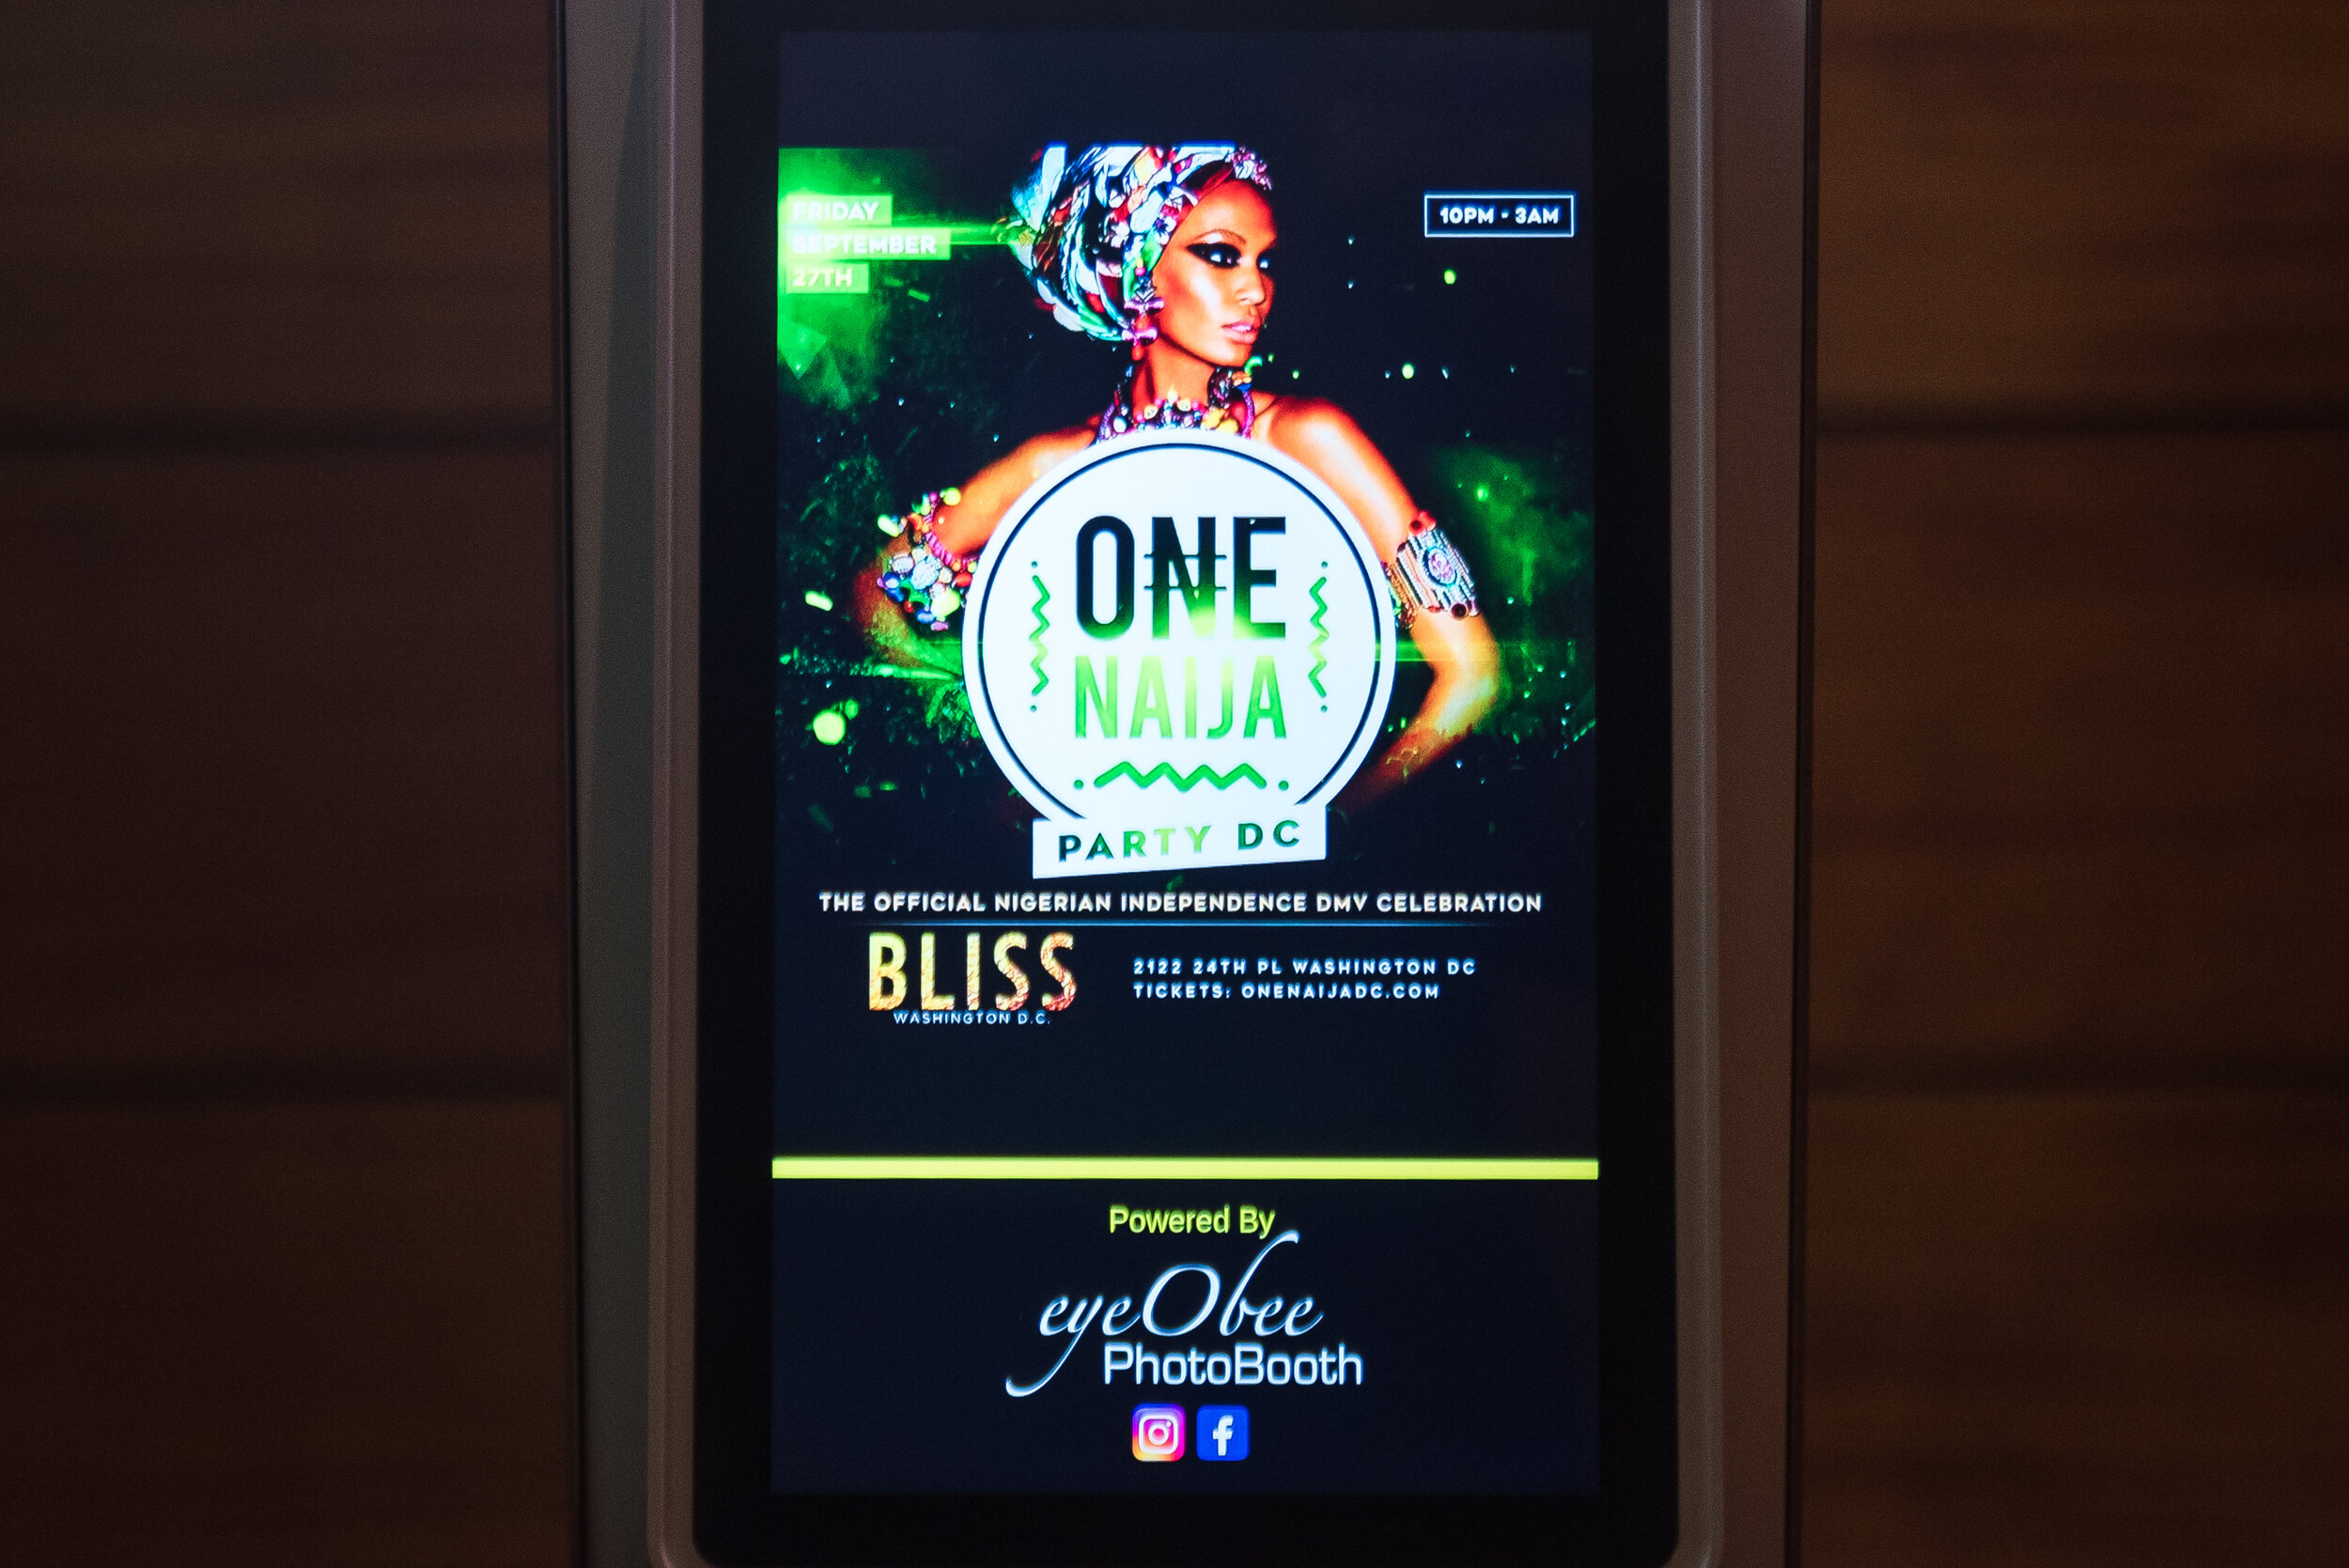 eyeObee PhotoBooth- One Naija Party 2019-01.jpg